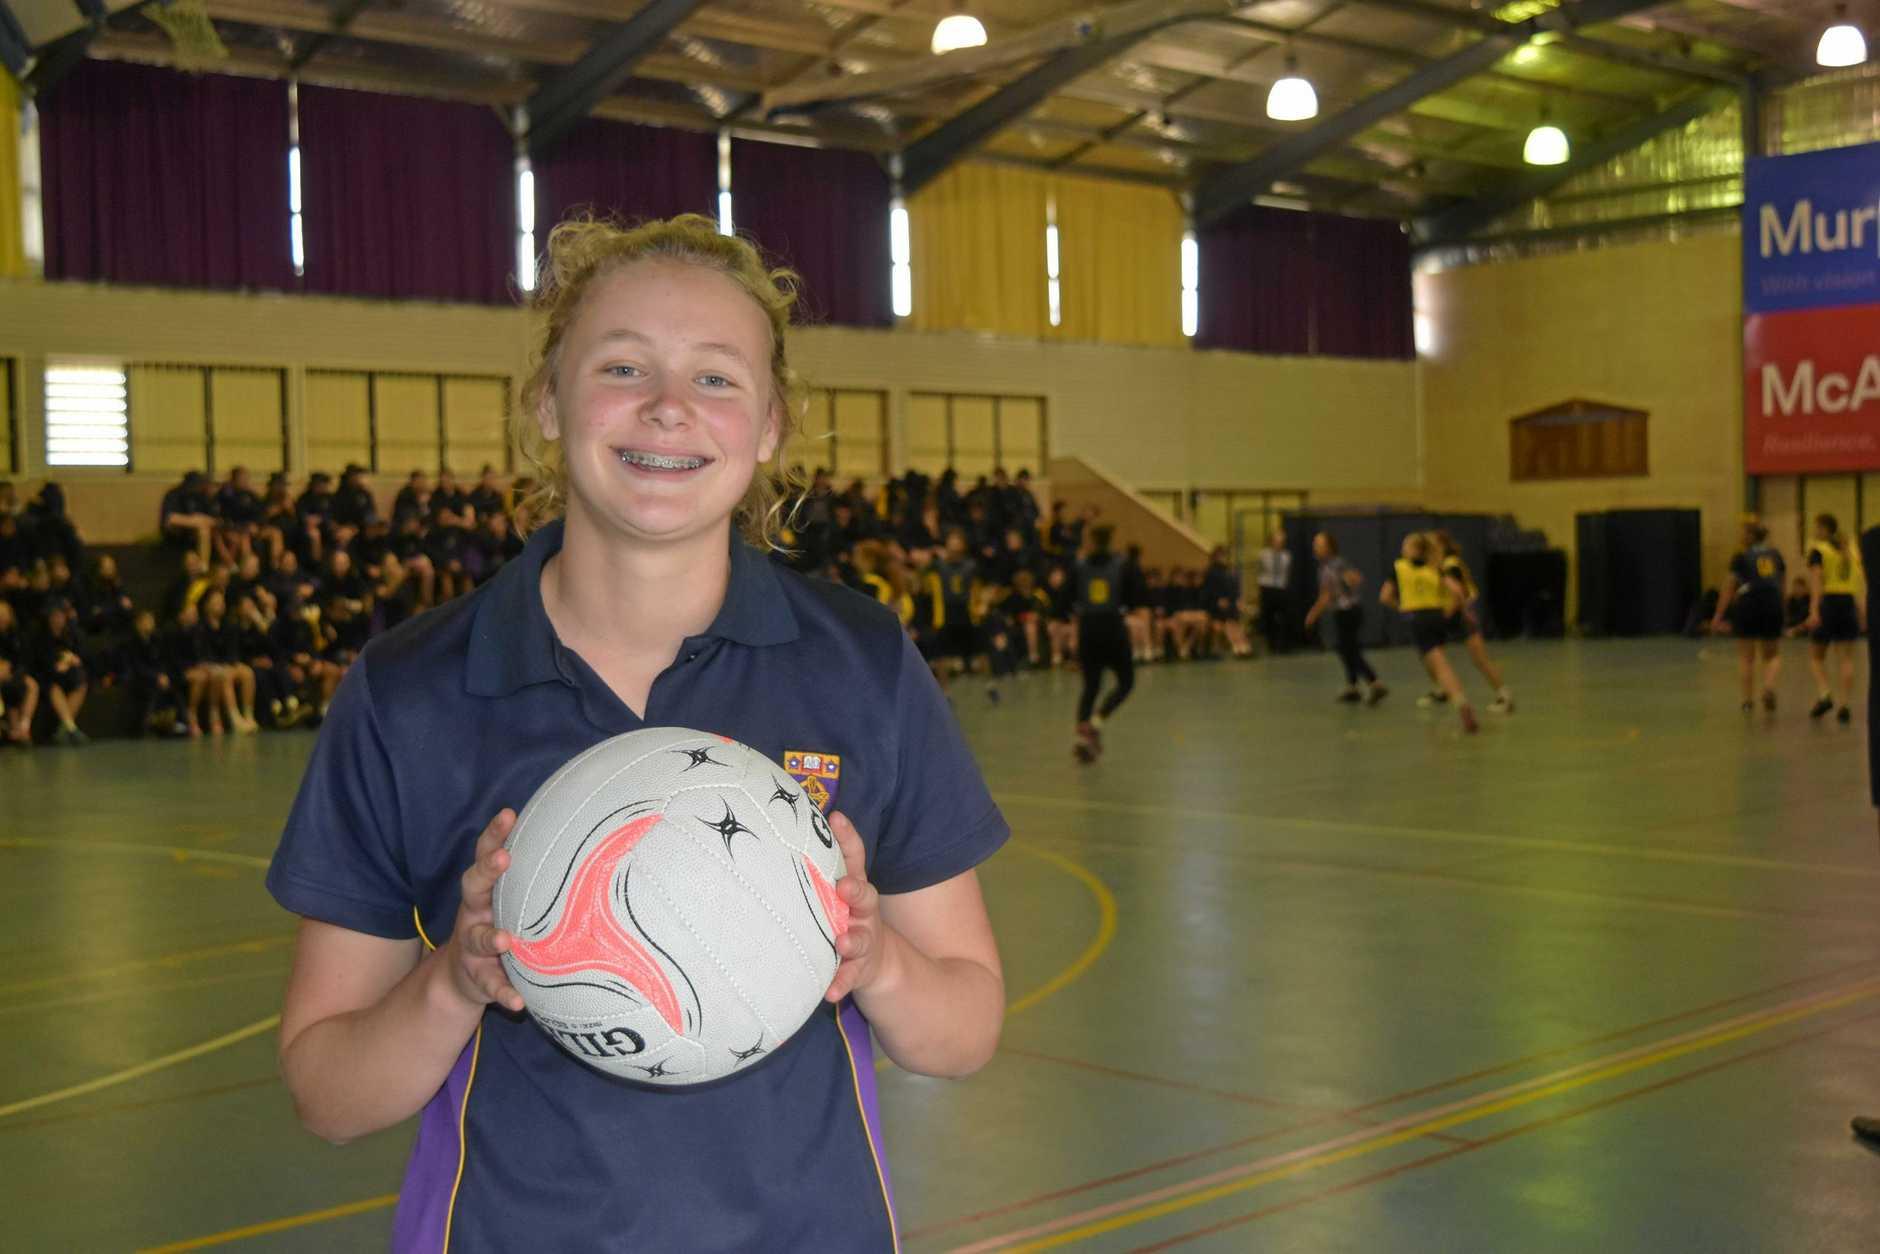 Kalei Brighton will captain the St Joseph's College netball team at the QISSN carnival in Bundaberg.